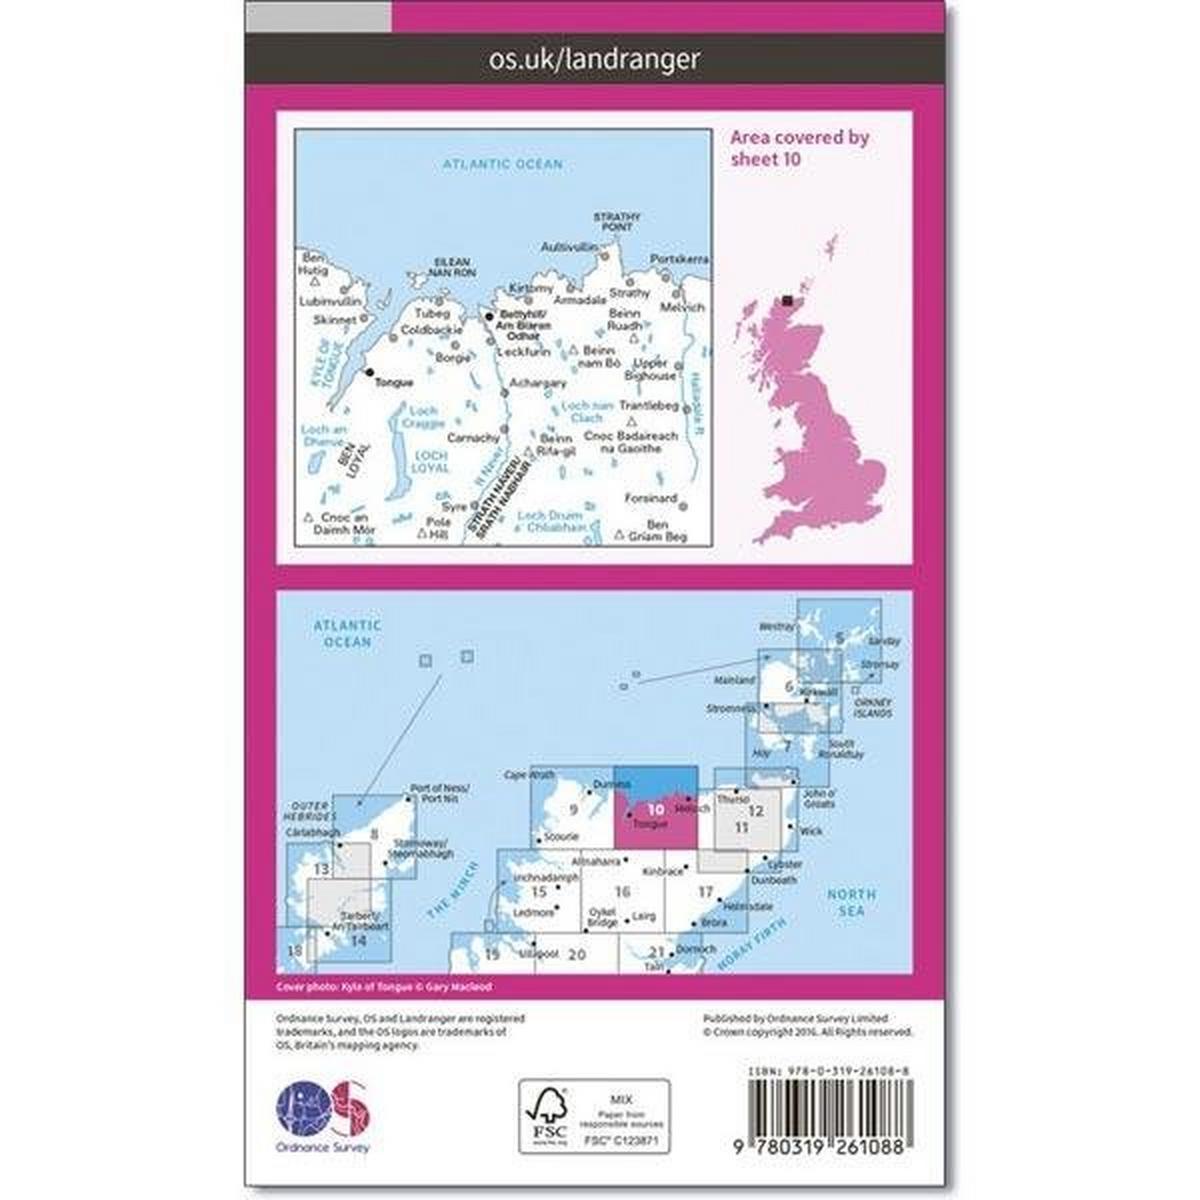 Ordnance Survey OS Landranger Map 10 Strath Naver, Bettyhill & Tongue